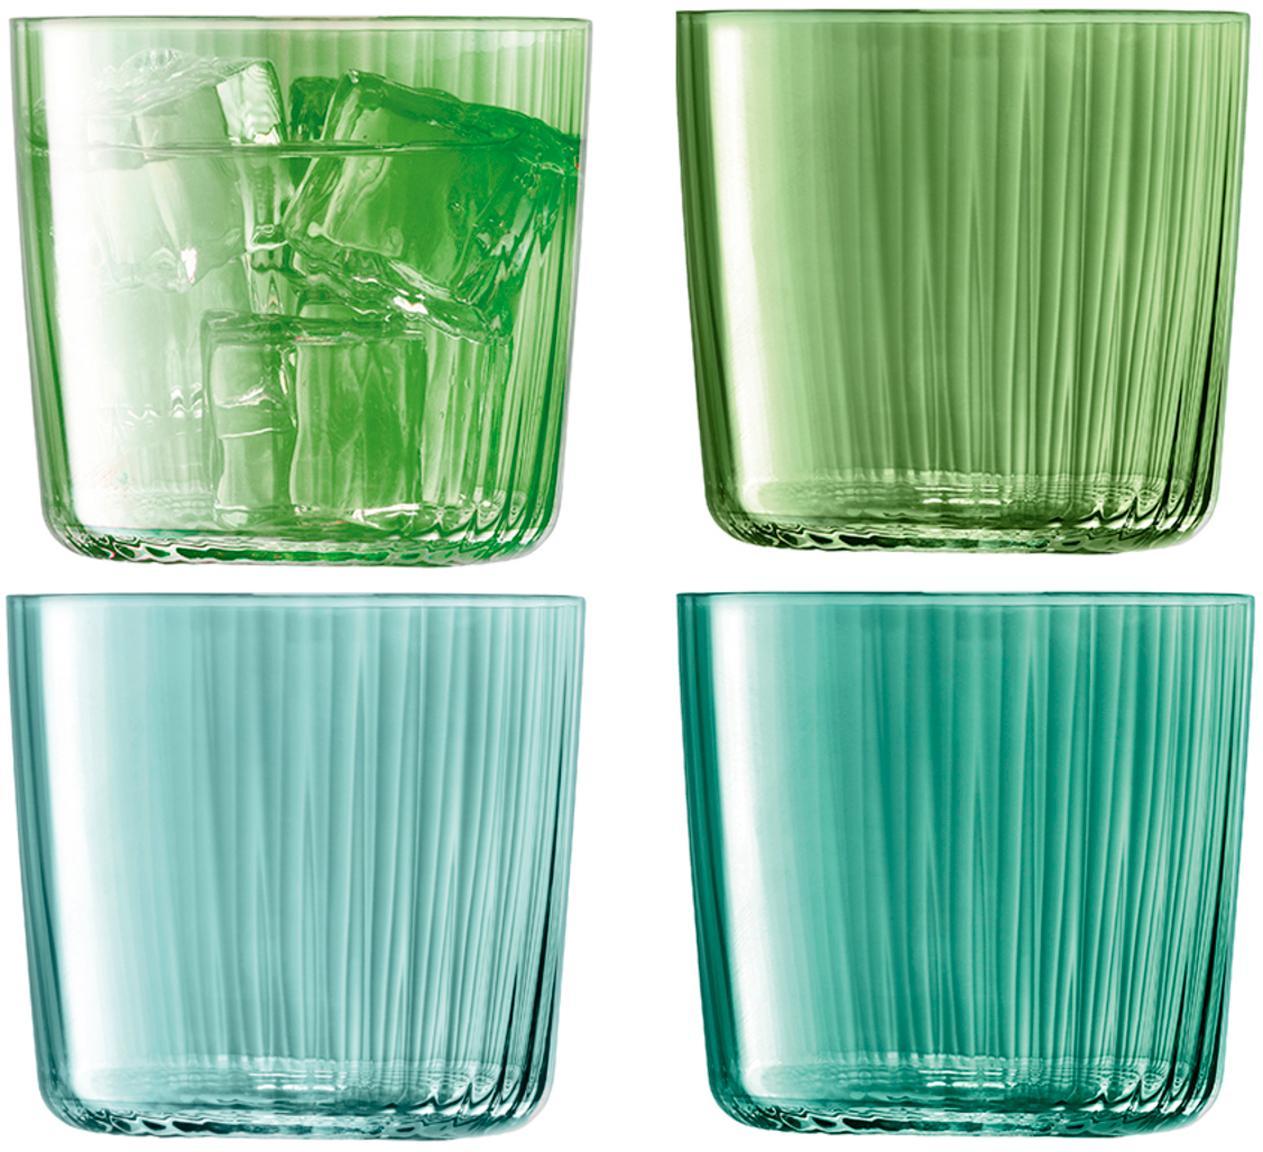 Set 4 bicchieri acqua in vetro soffiato Gemme, Vetro, gonfiabile, Tonalità verde, Ø 8 x Alt. 7 cm